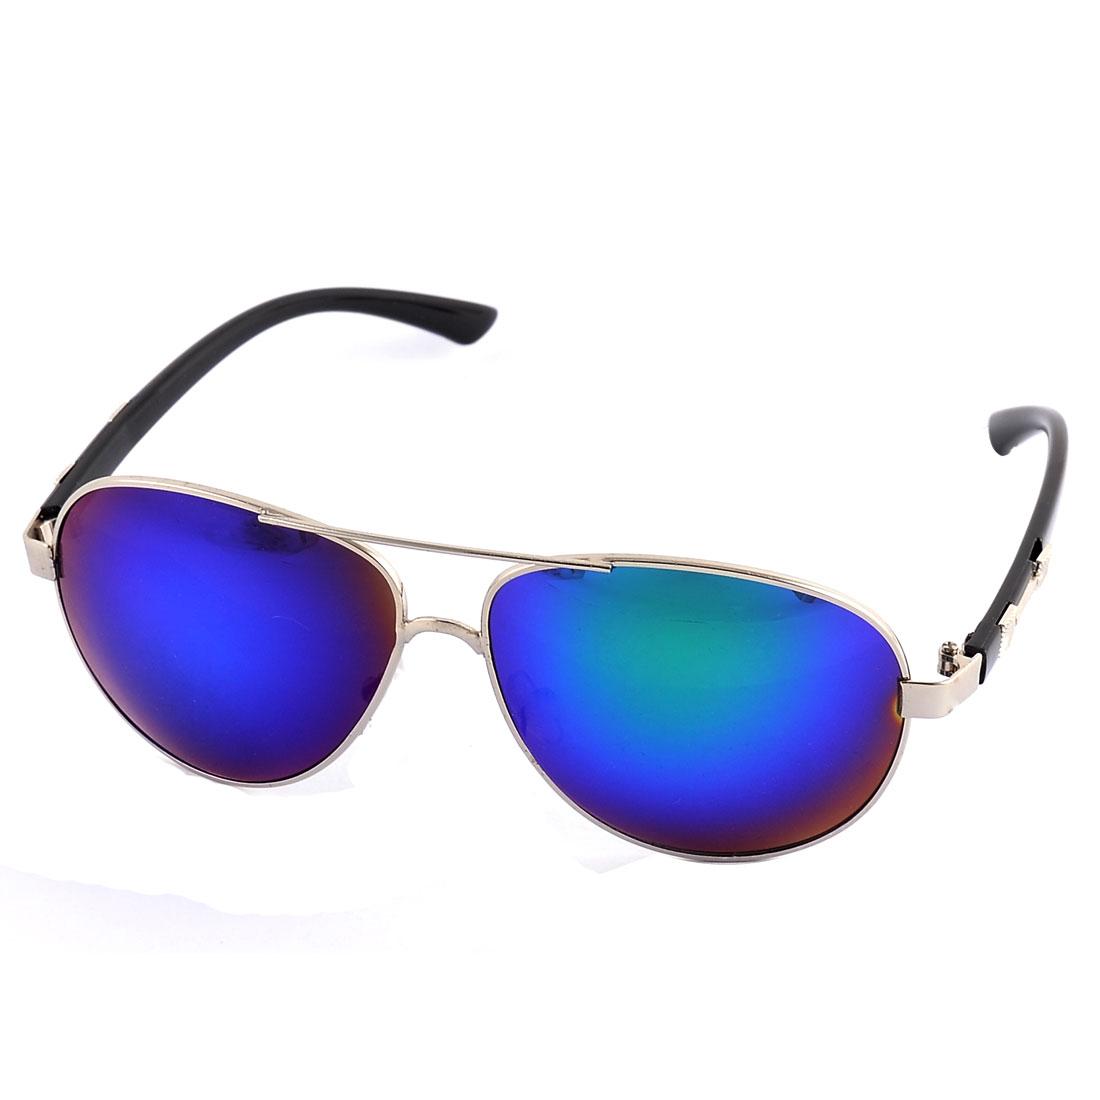 Outdside Full Rim Sun Protection Plastic Arm Single Bridge Black Lens Sunglasses